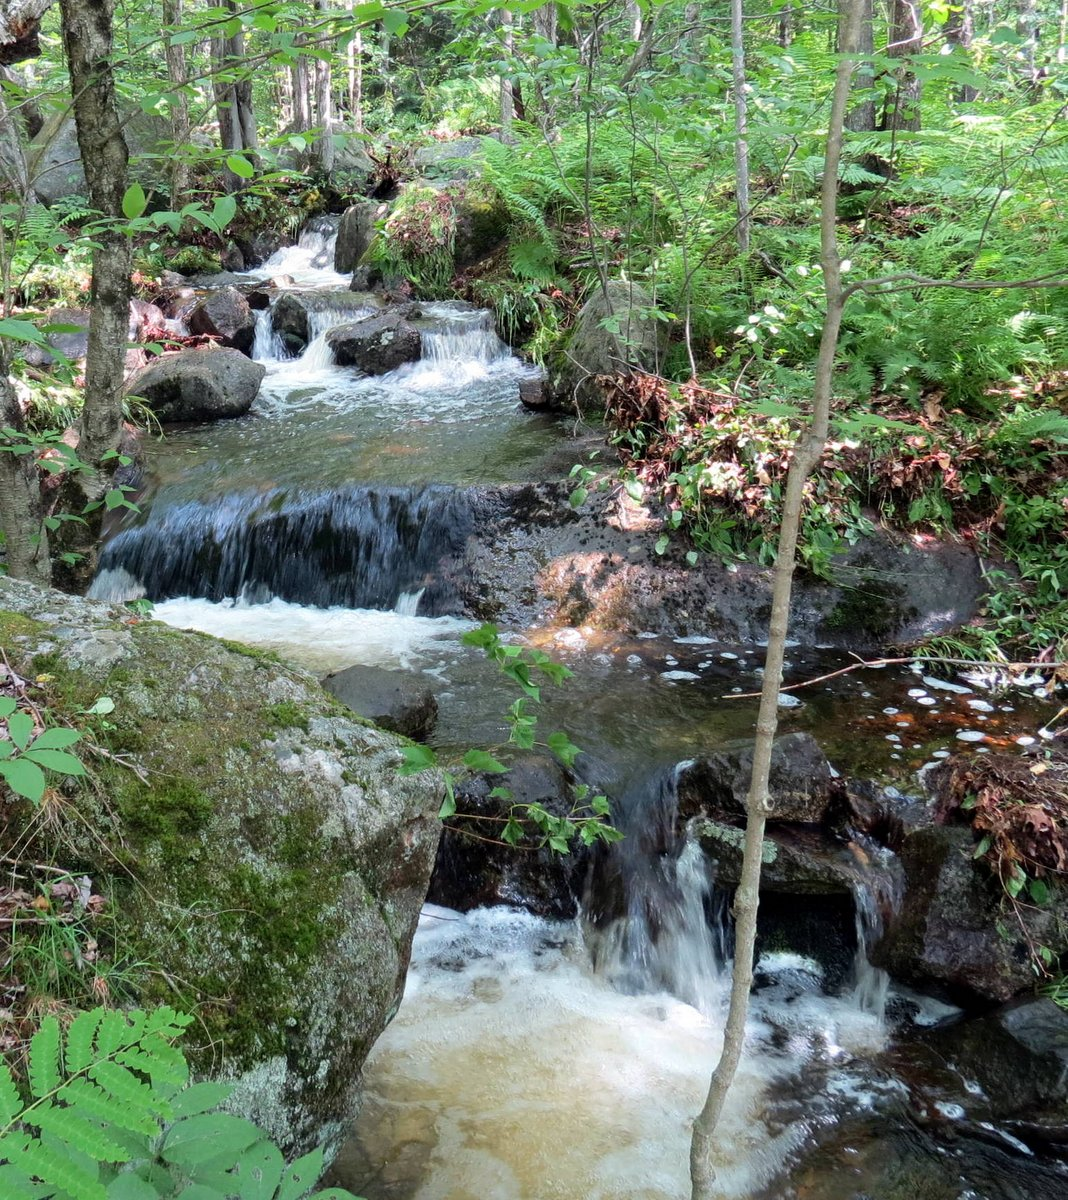 6. Waterfalls